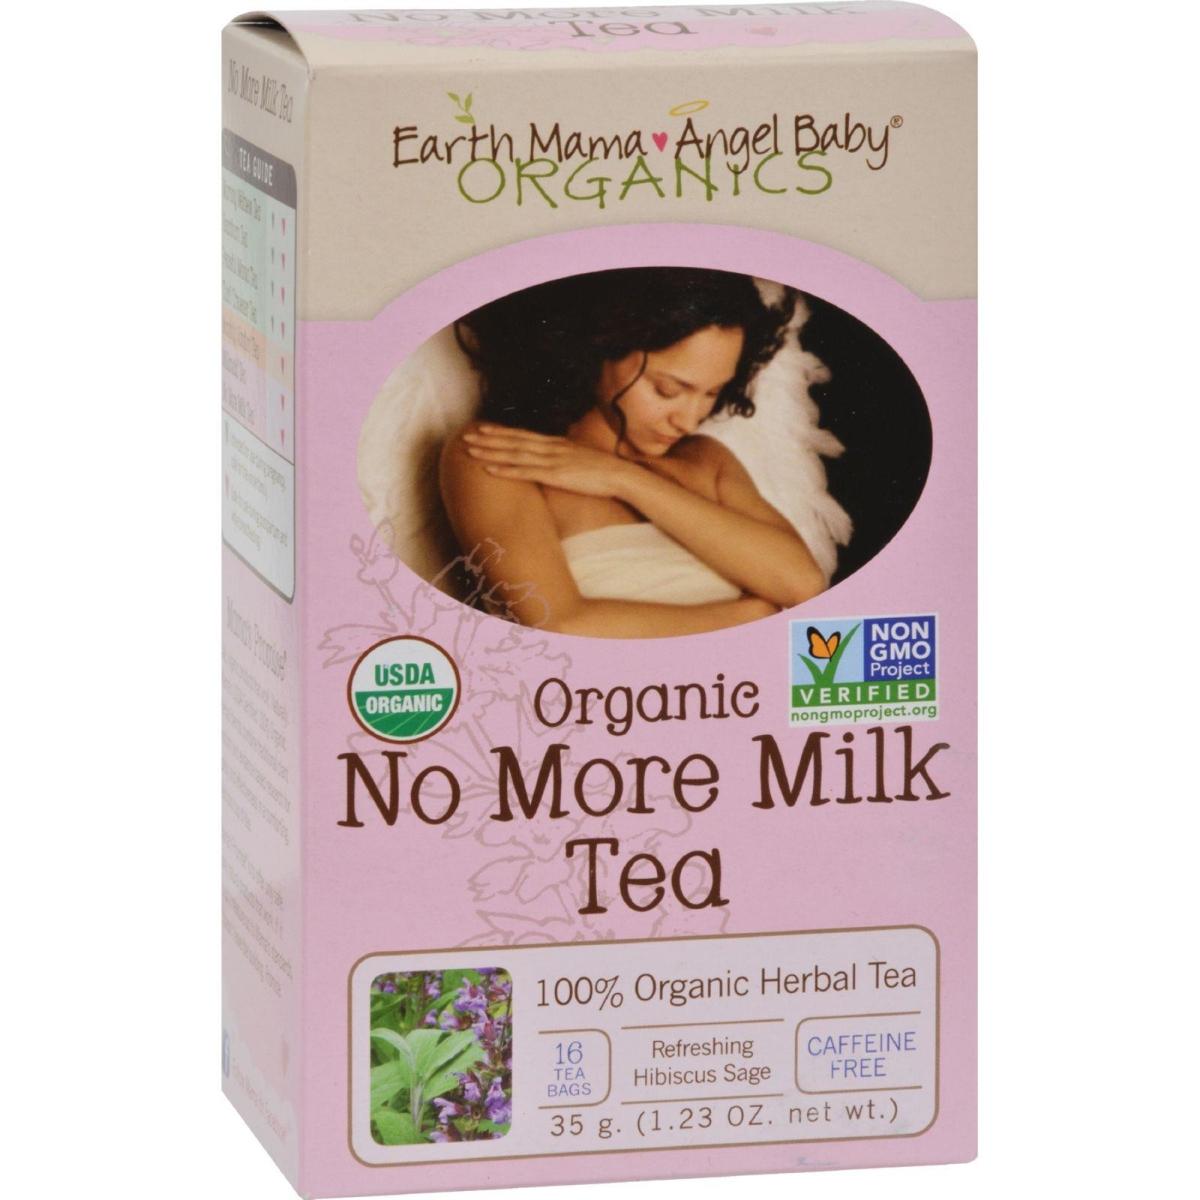 Earth Mama Angel Baby HG0849067 Organic No More Milk Tea - 16 Tea Bags